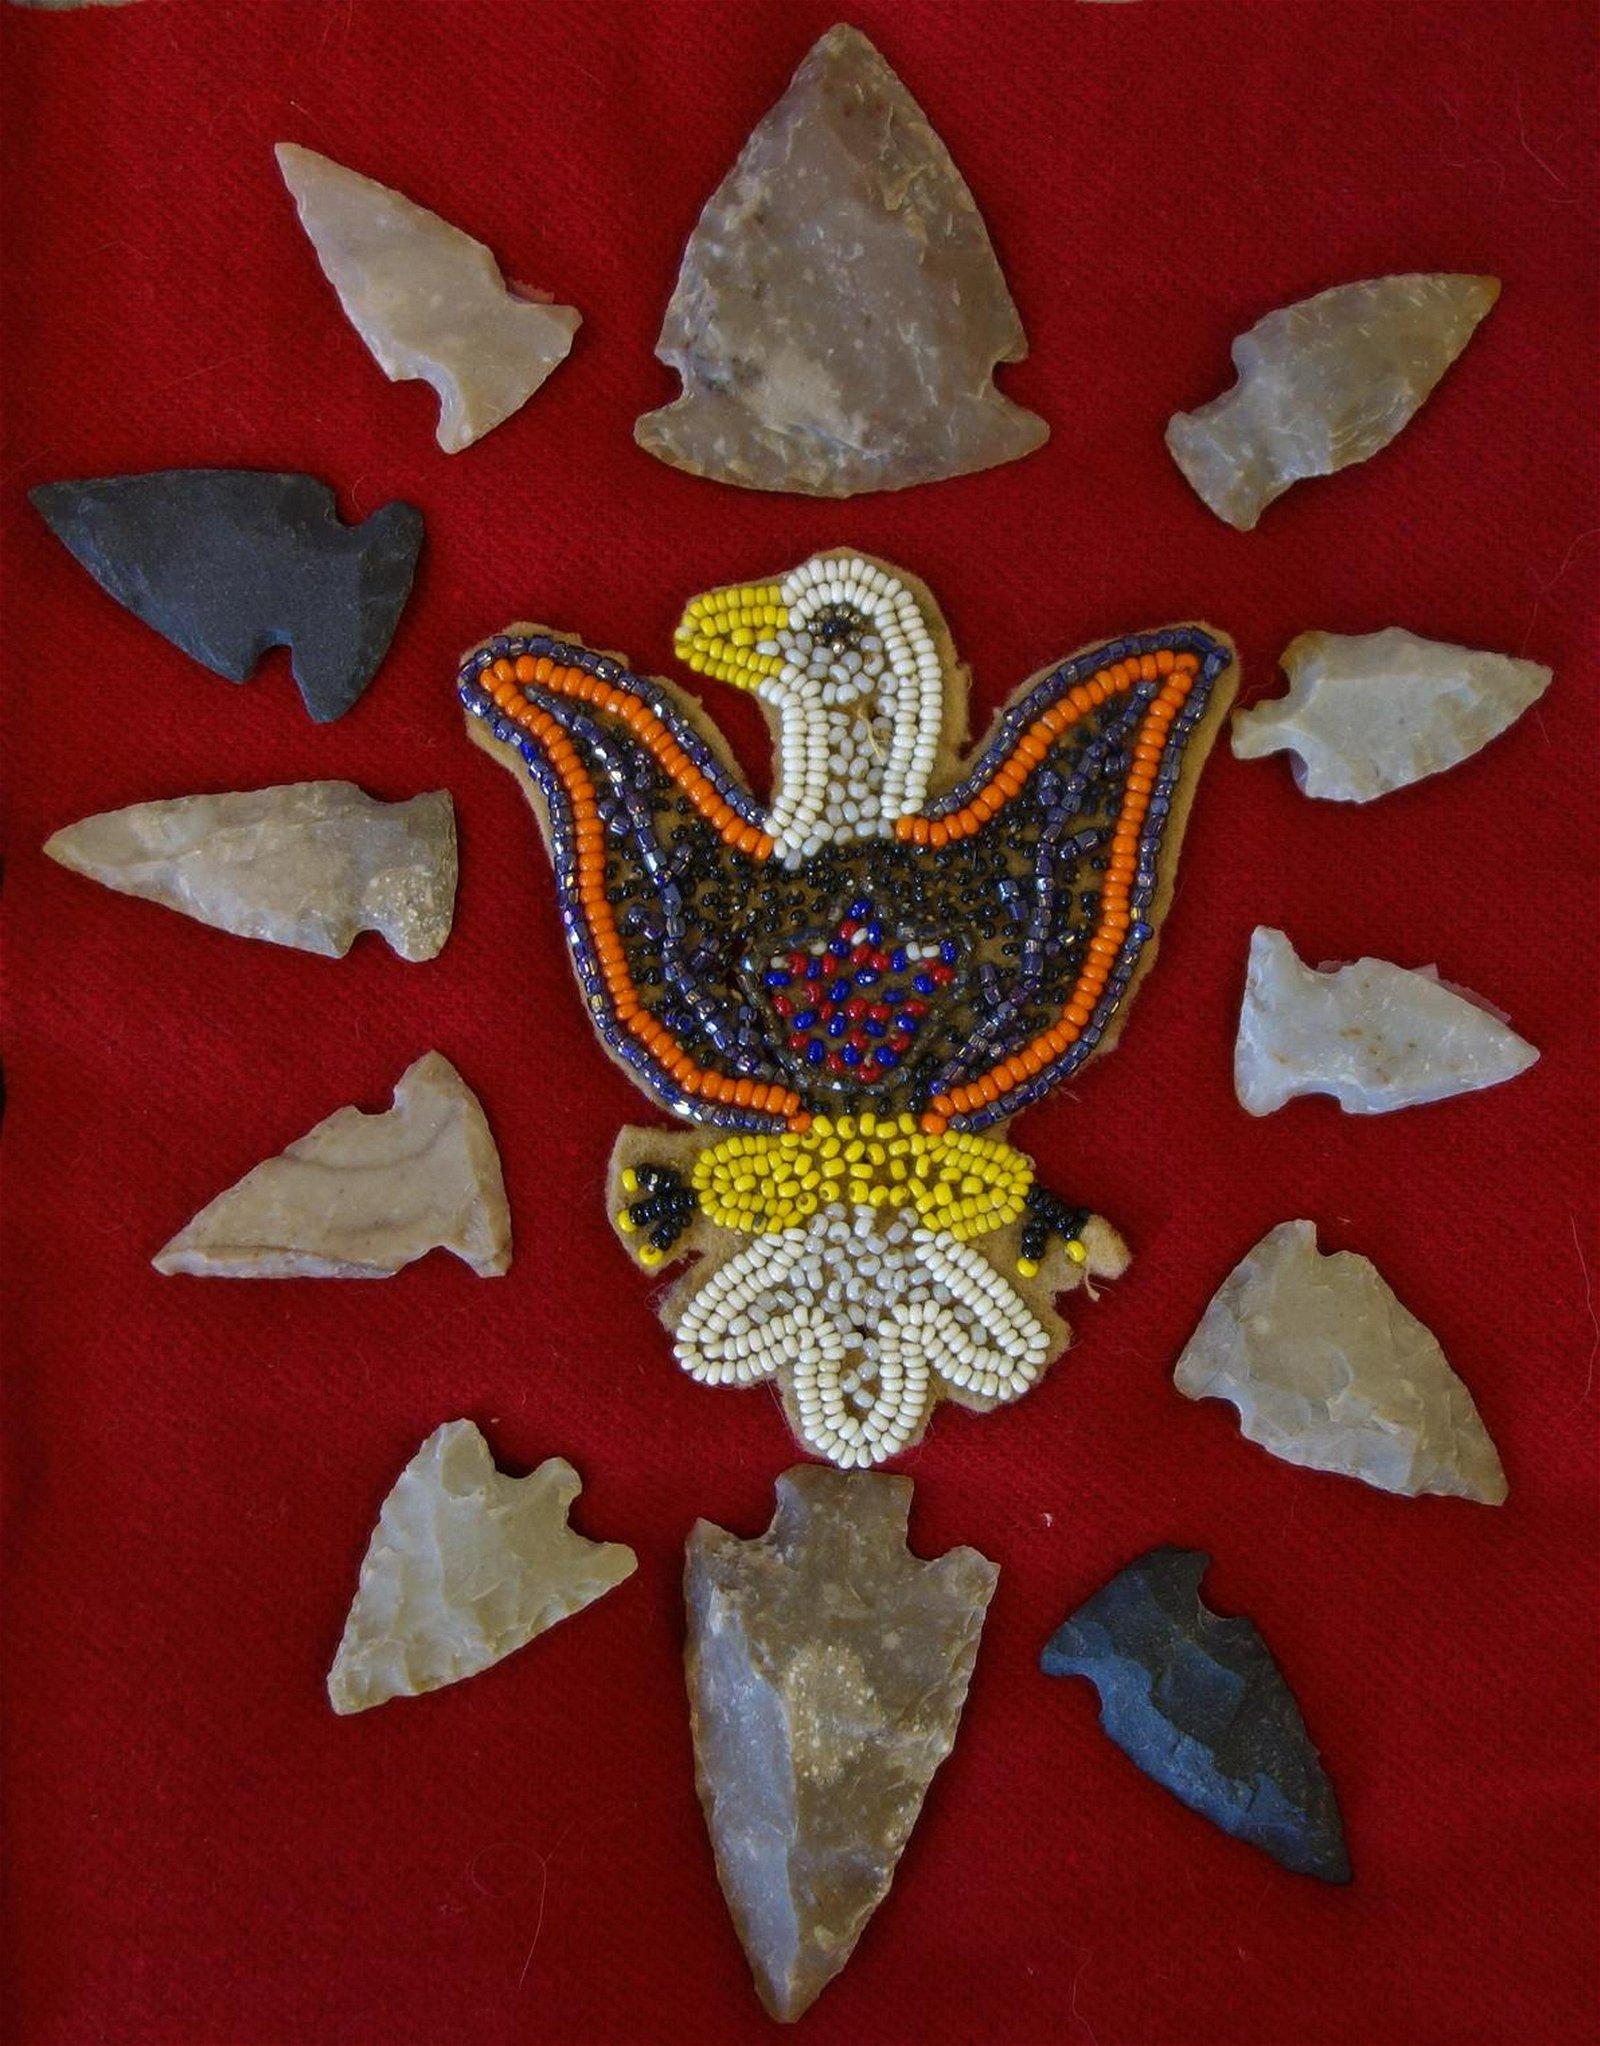 Indian Arrowhead Collection & Beaded Eagle